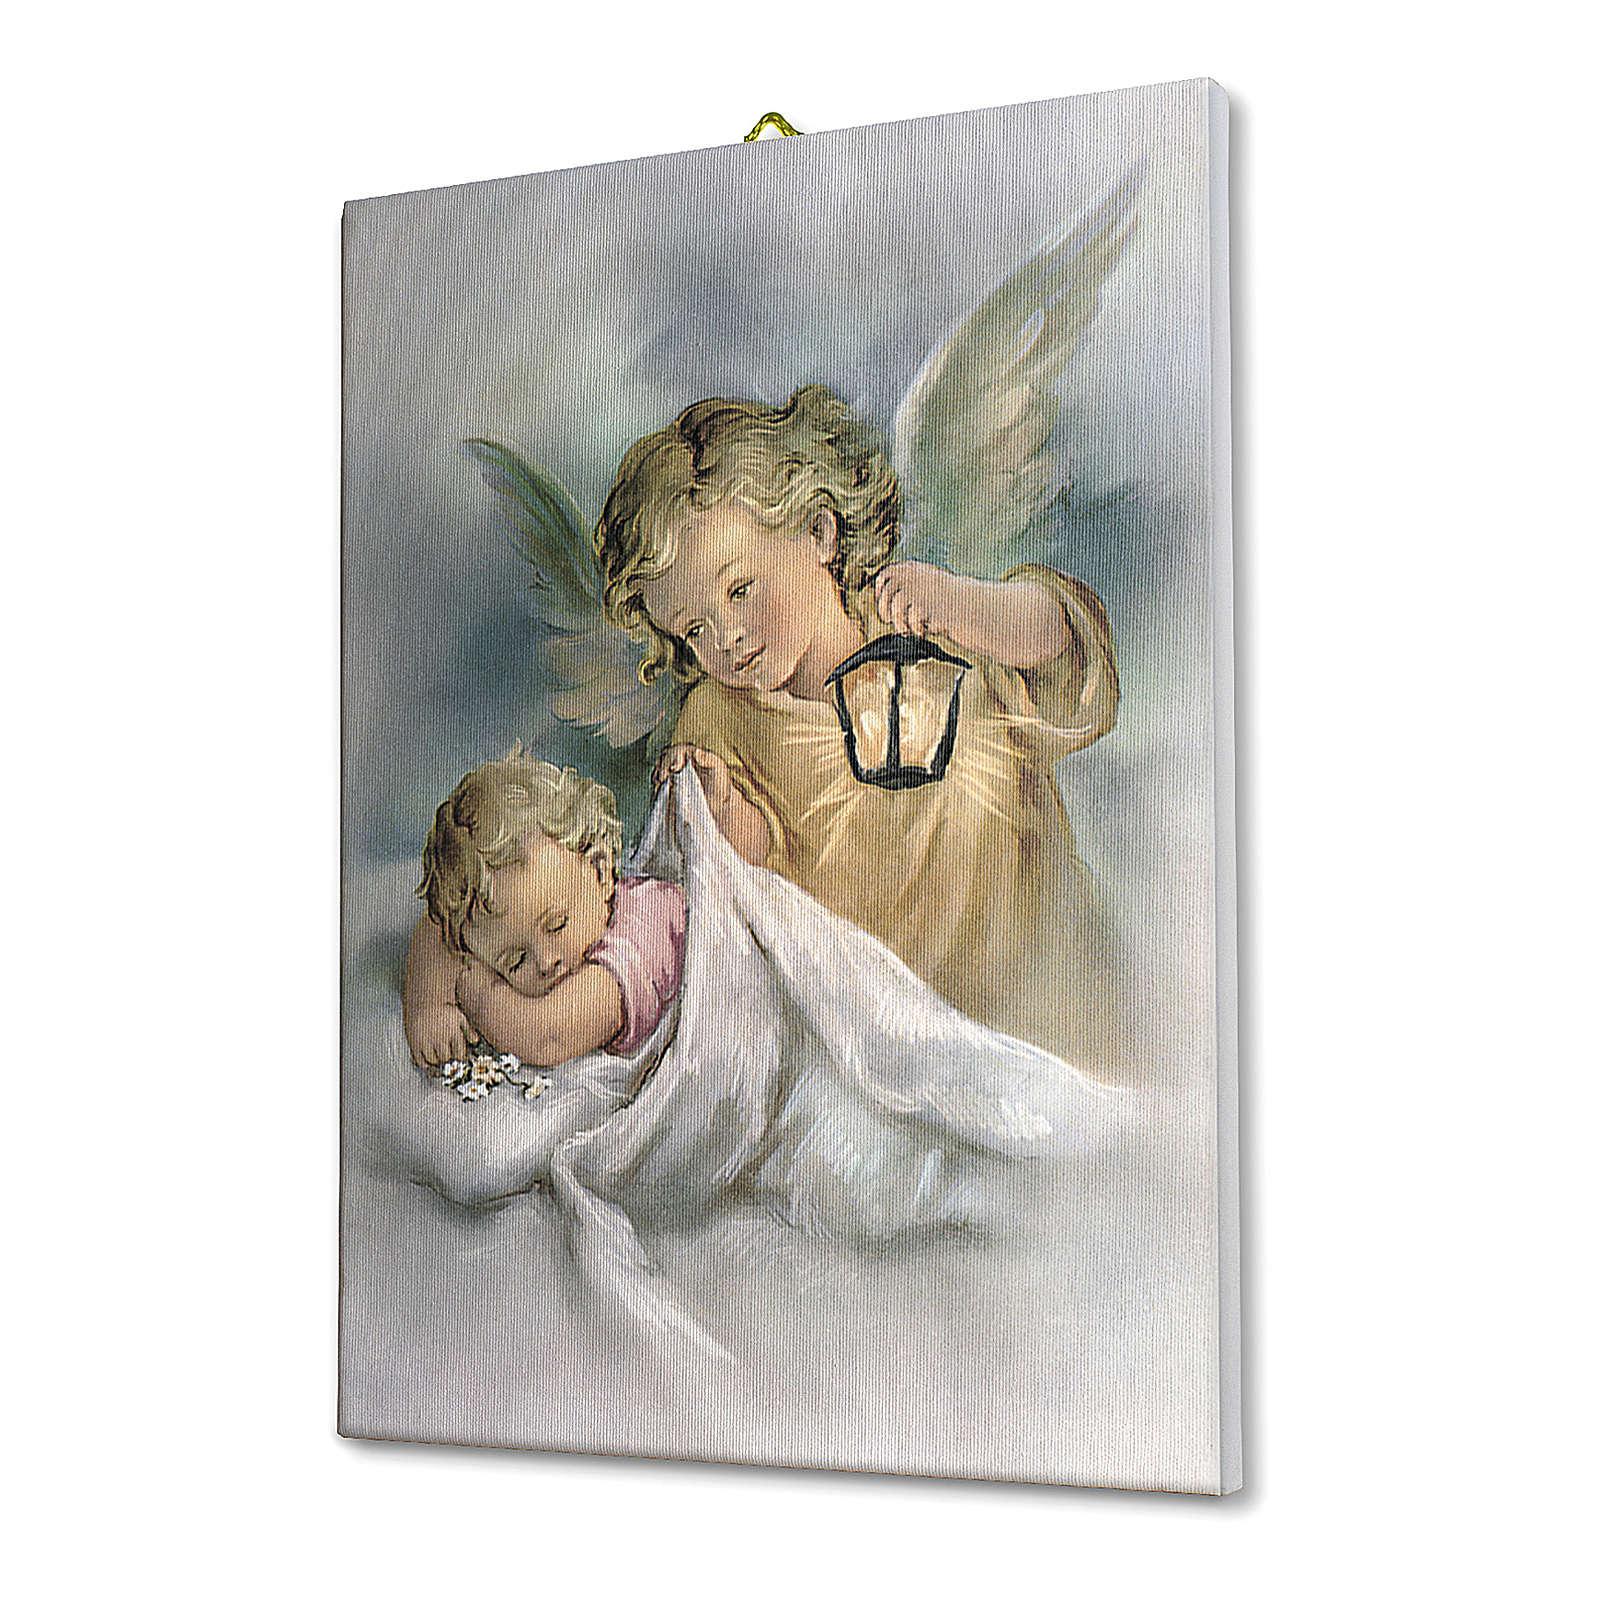 Quadro su tela pittorica Angelo Custode con Lanterna 70x50 cm 3